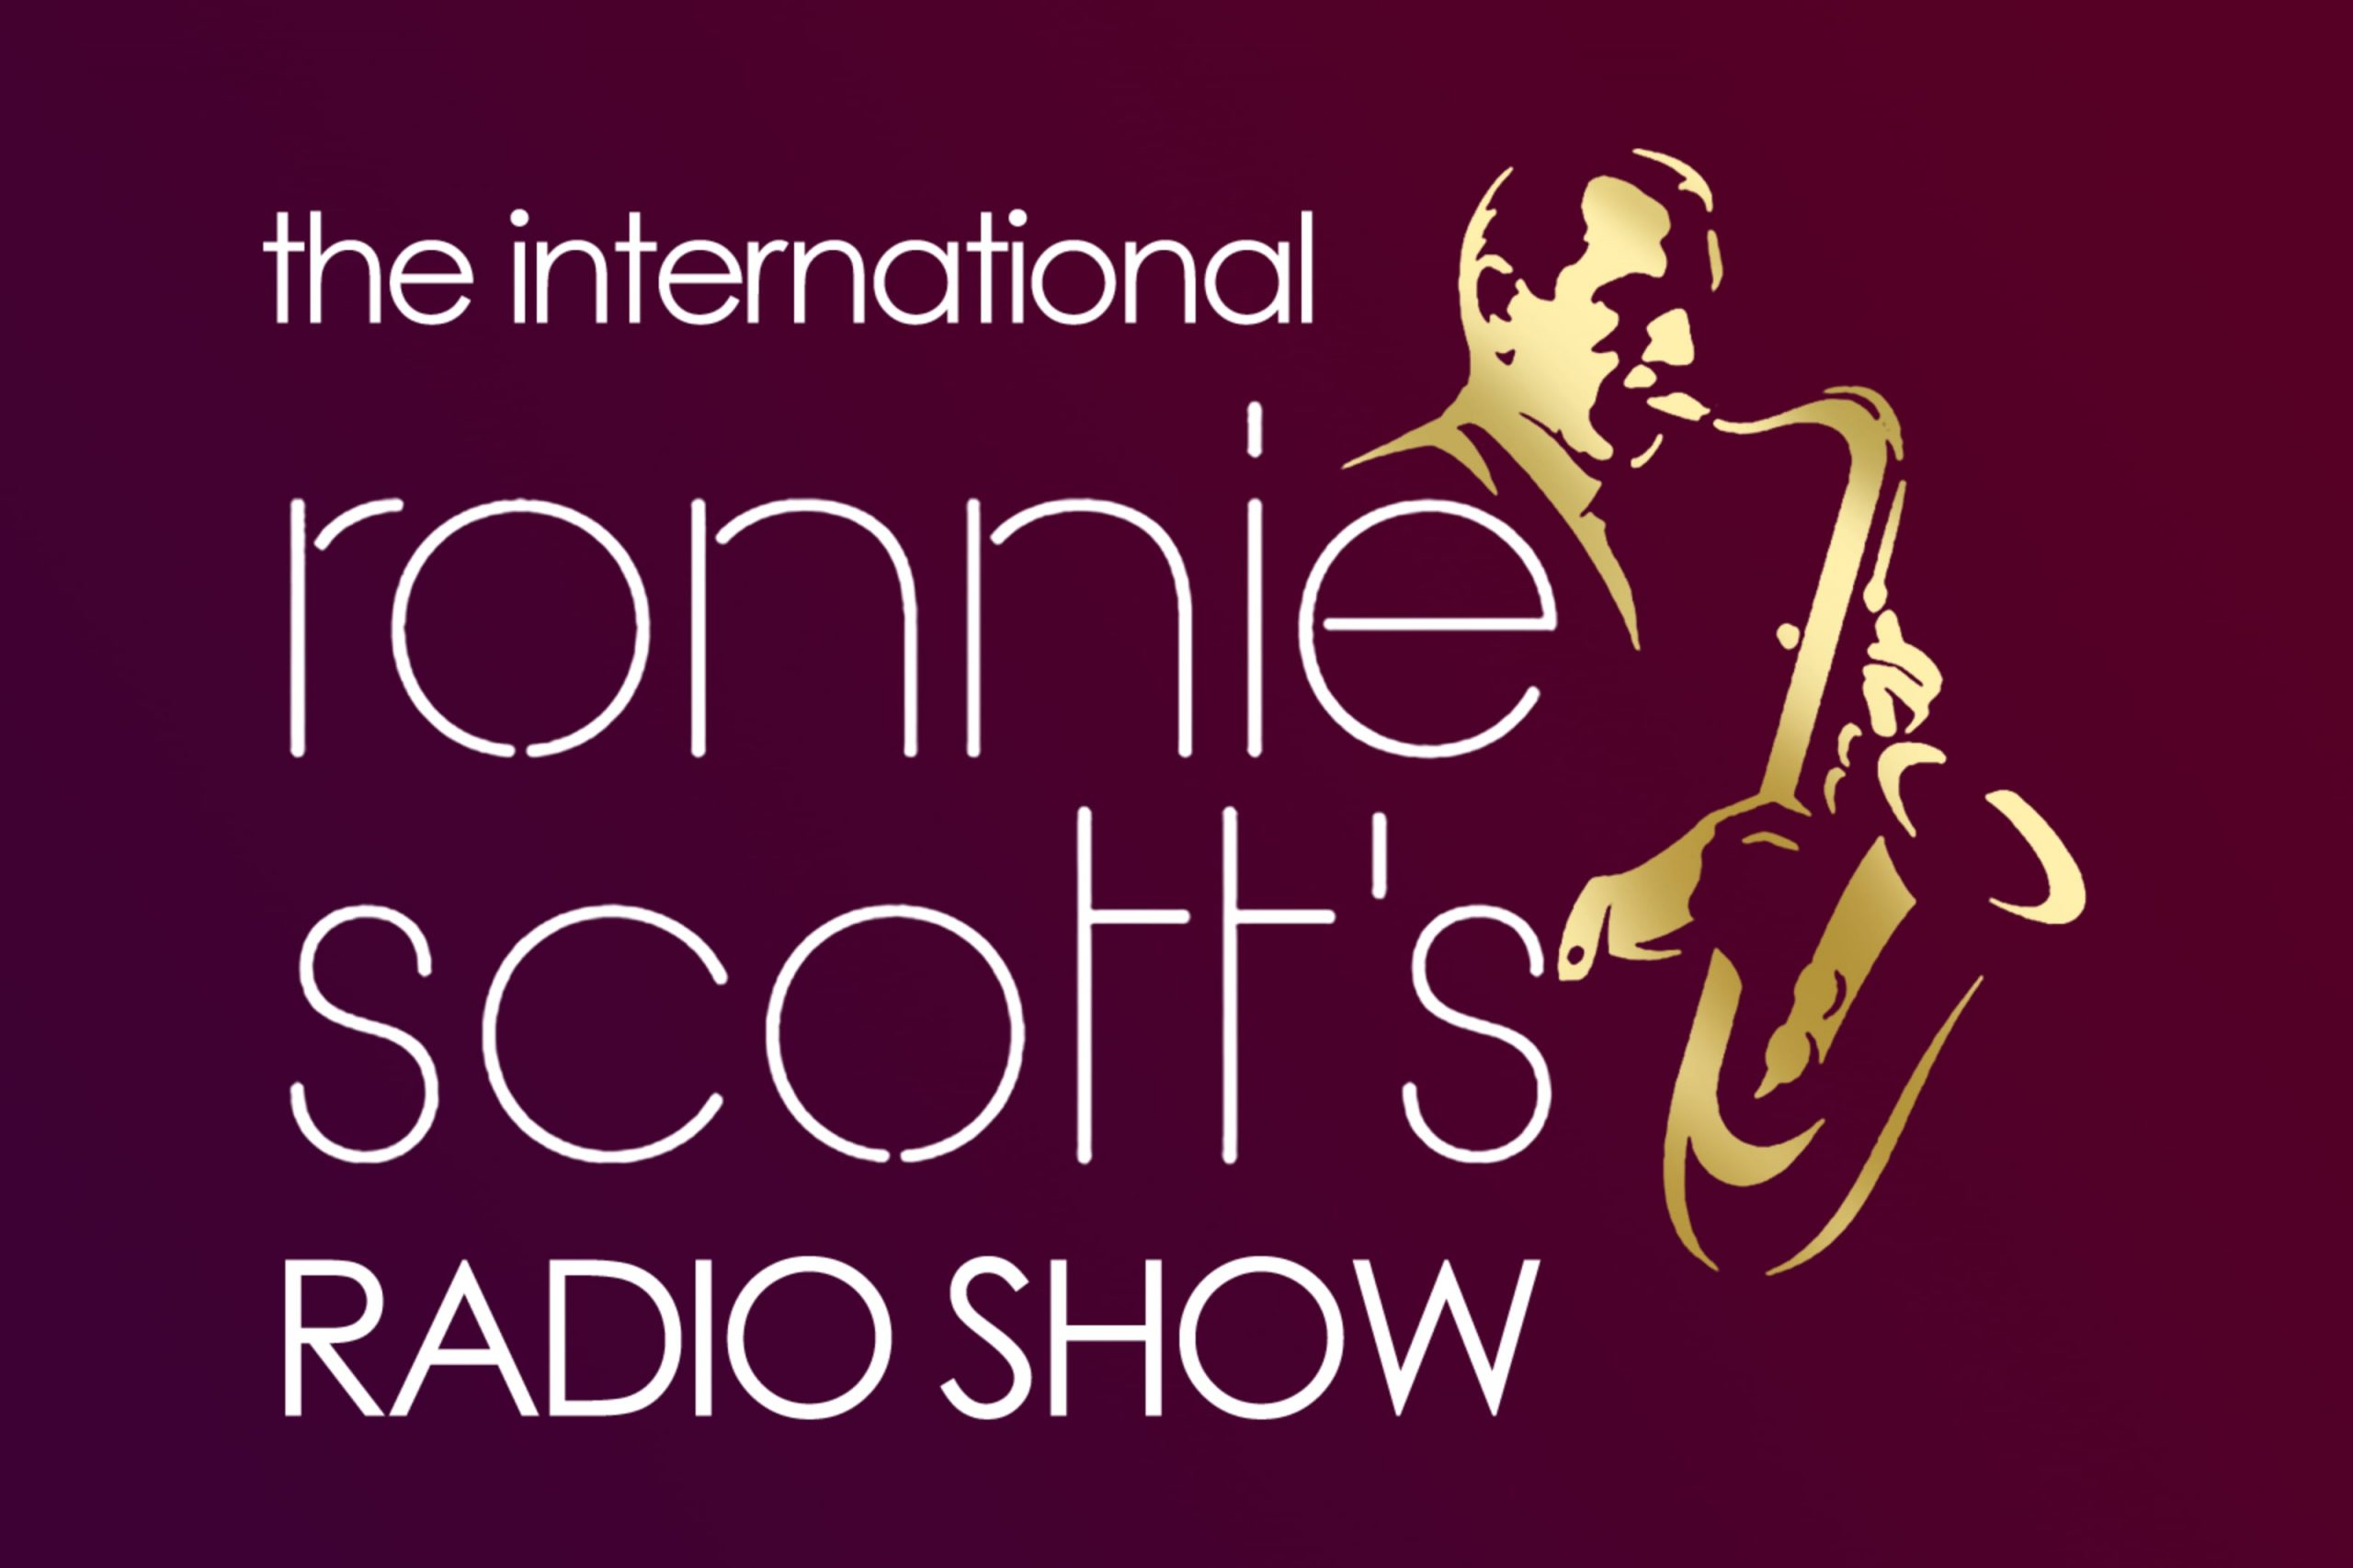 Ronnie Scotts radio show